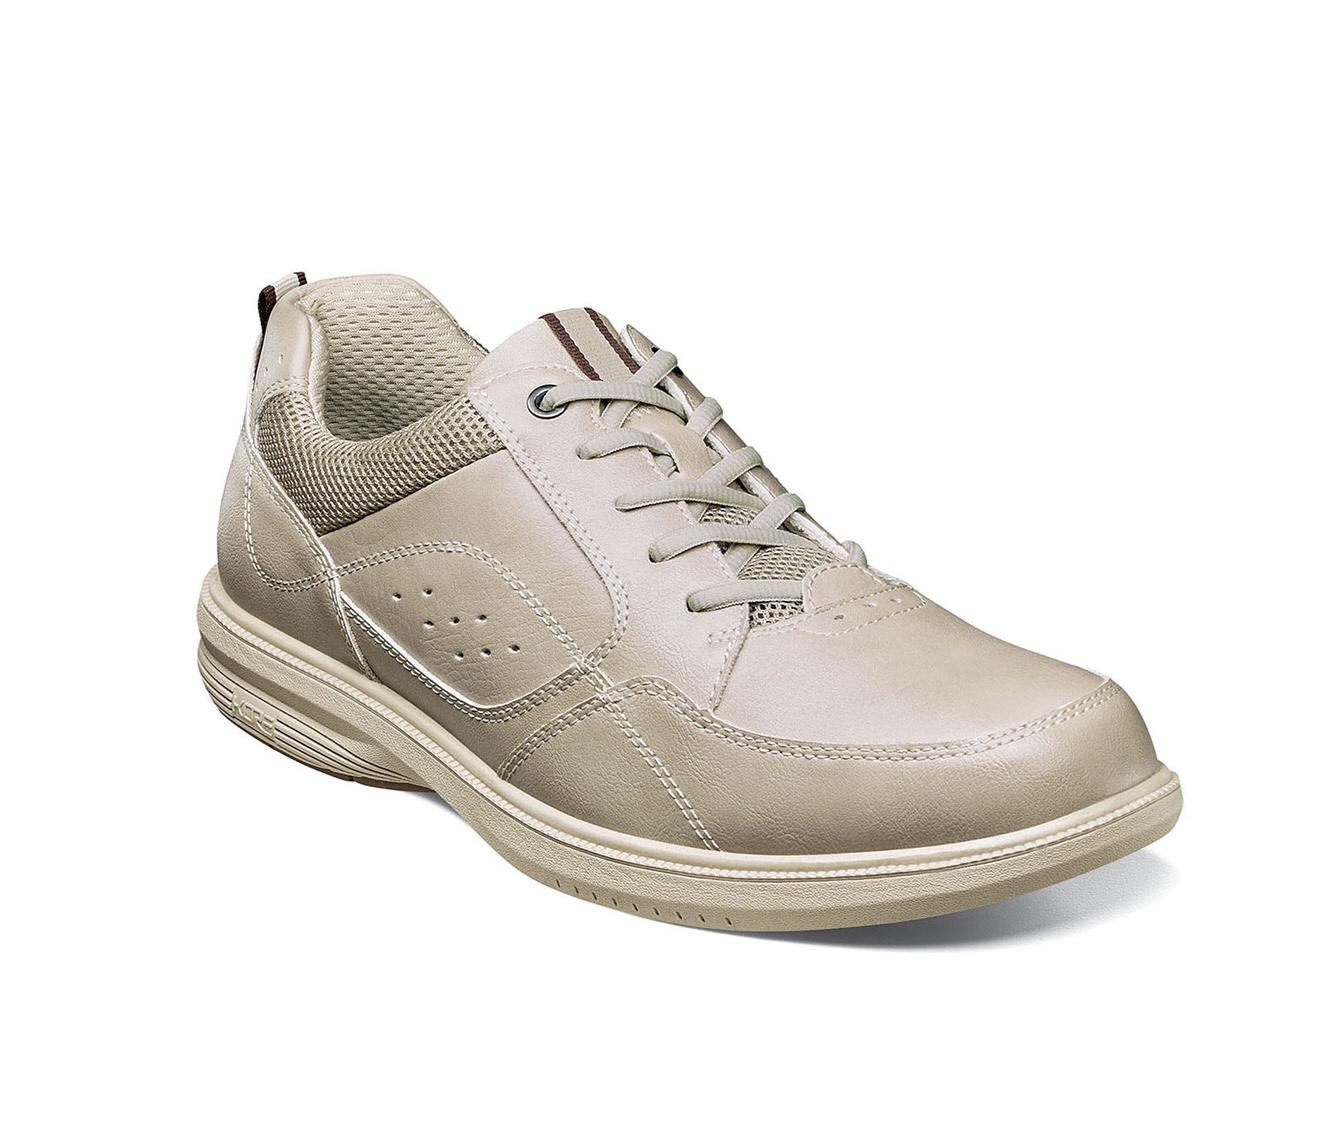 Nunn Bush Kore Walk Moc Toe Ox Casual Shoes